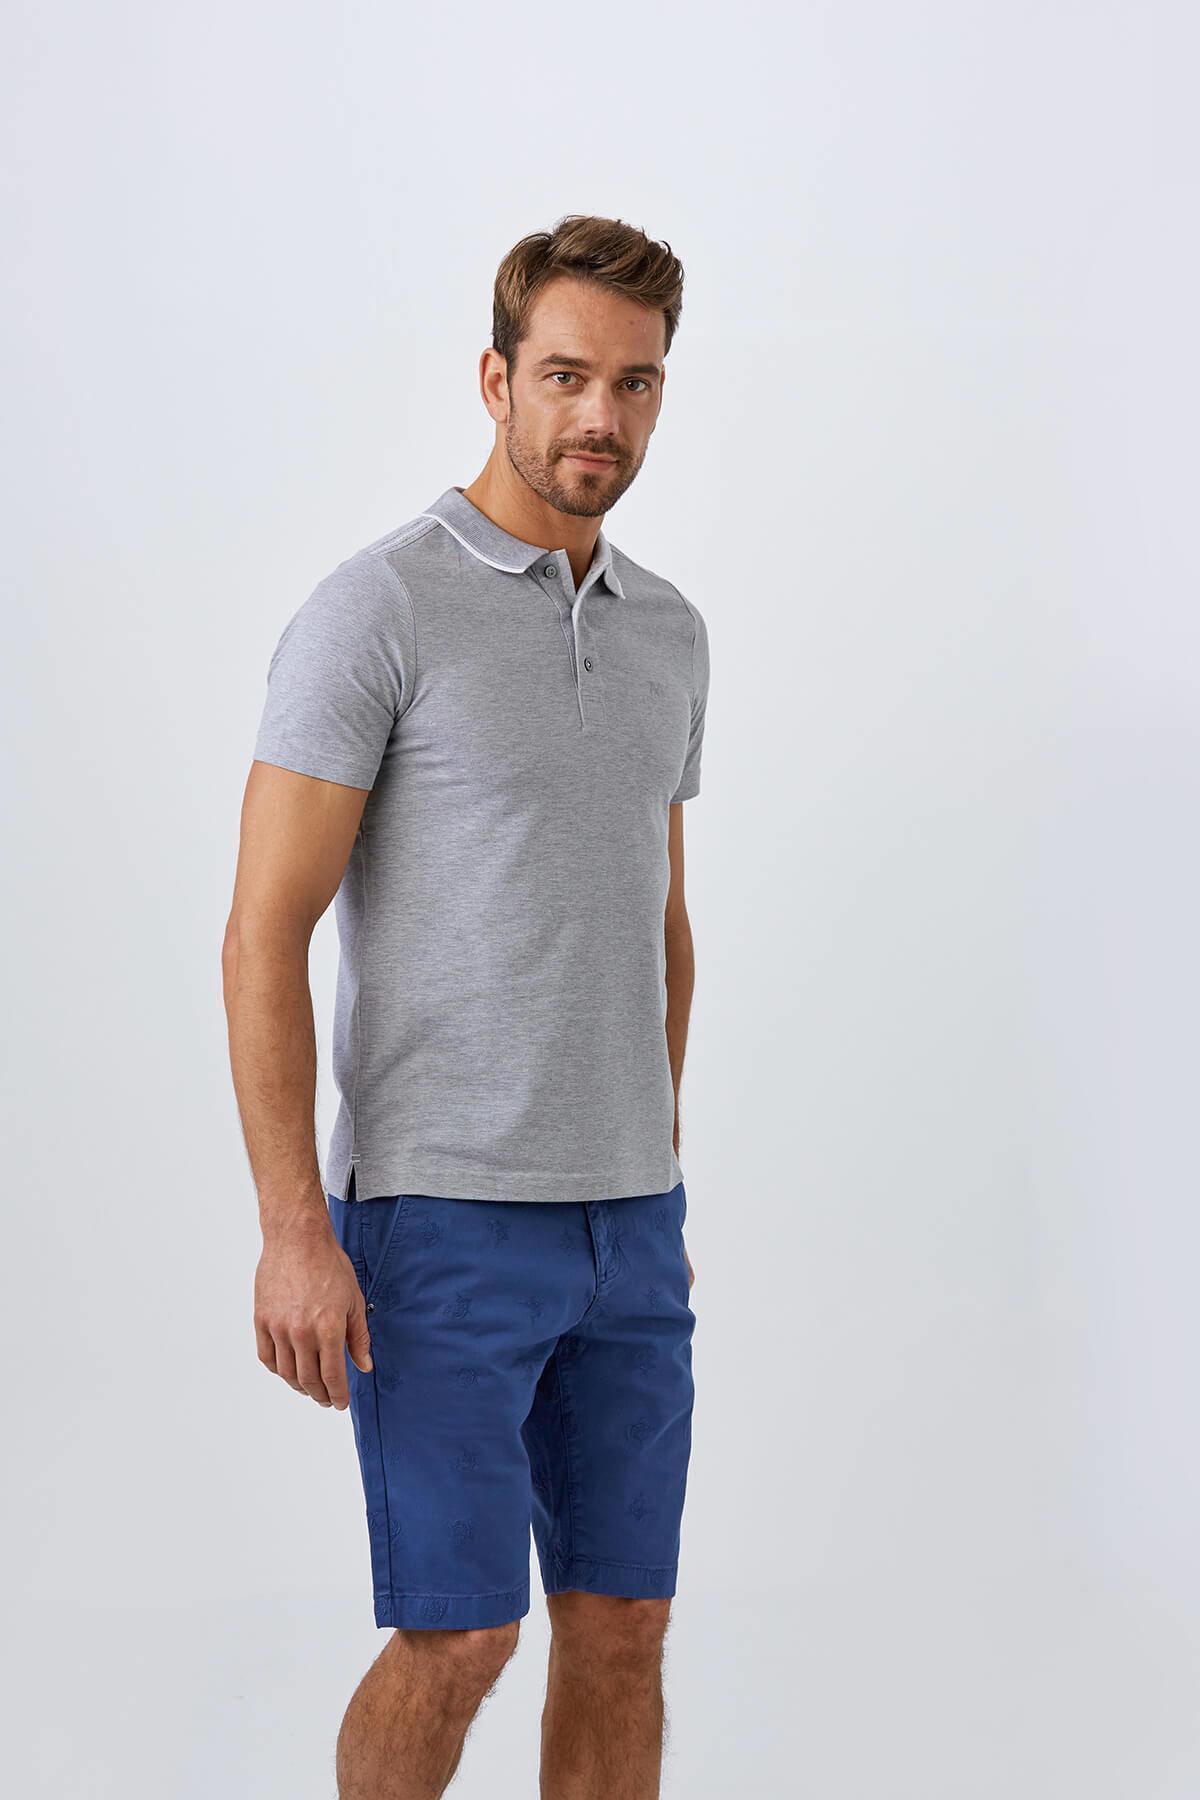 Açık Gri Polo Yaka T-Shirt